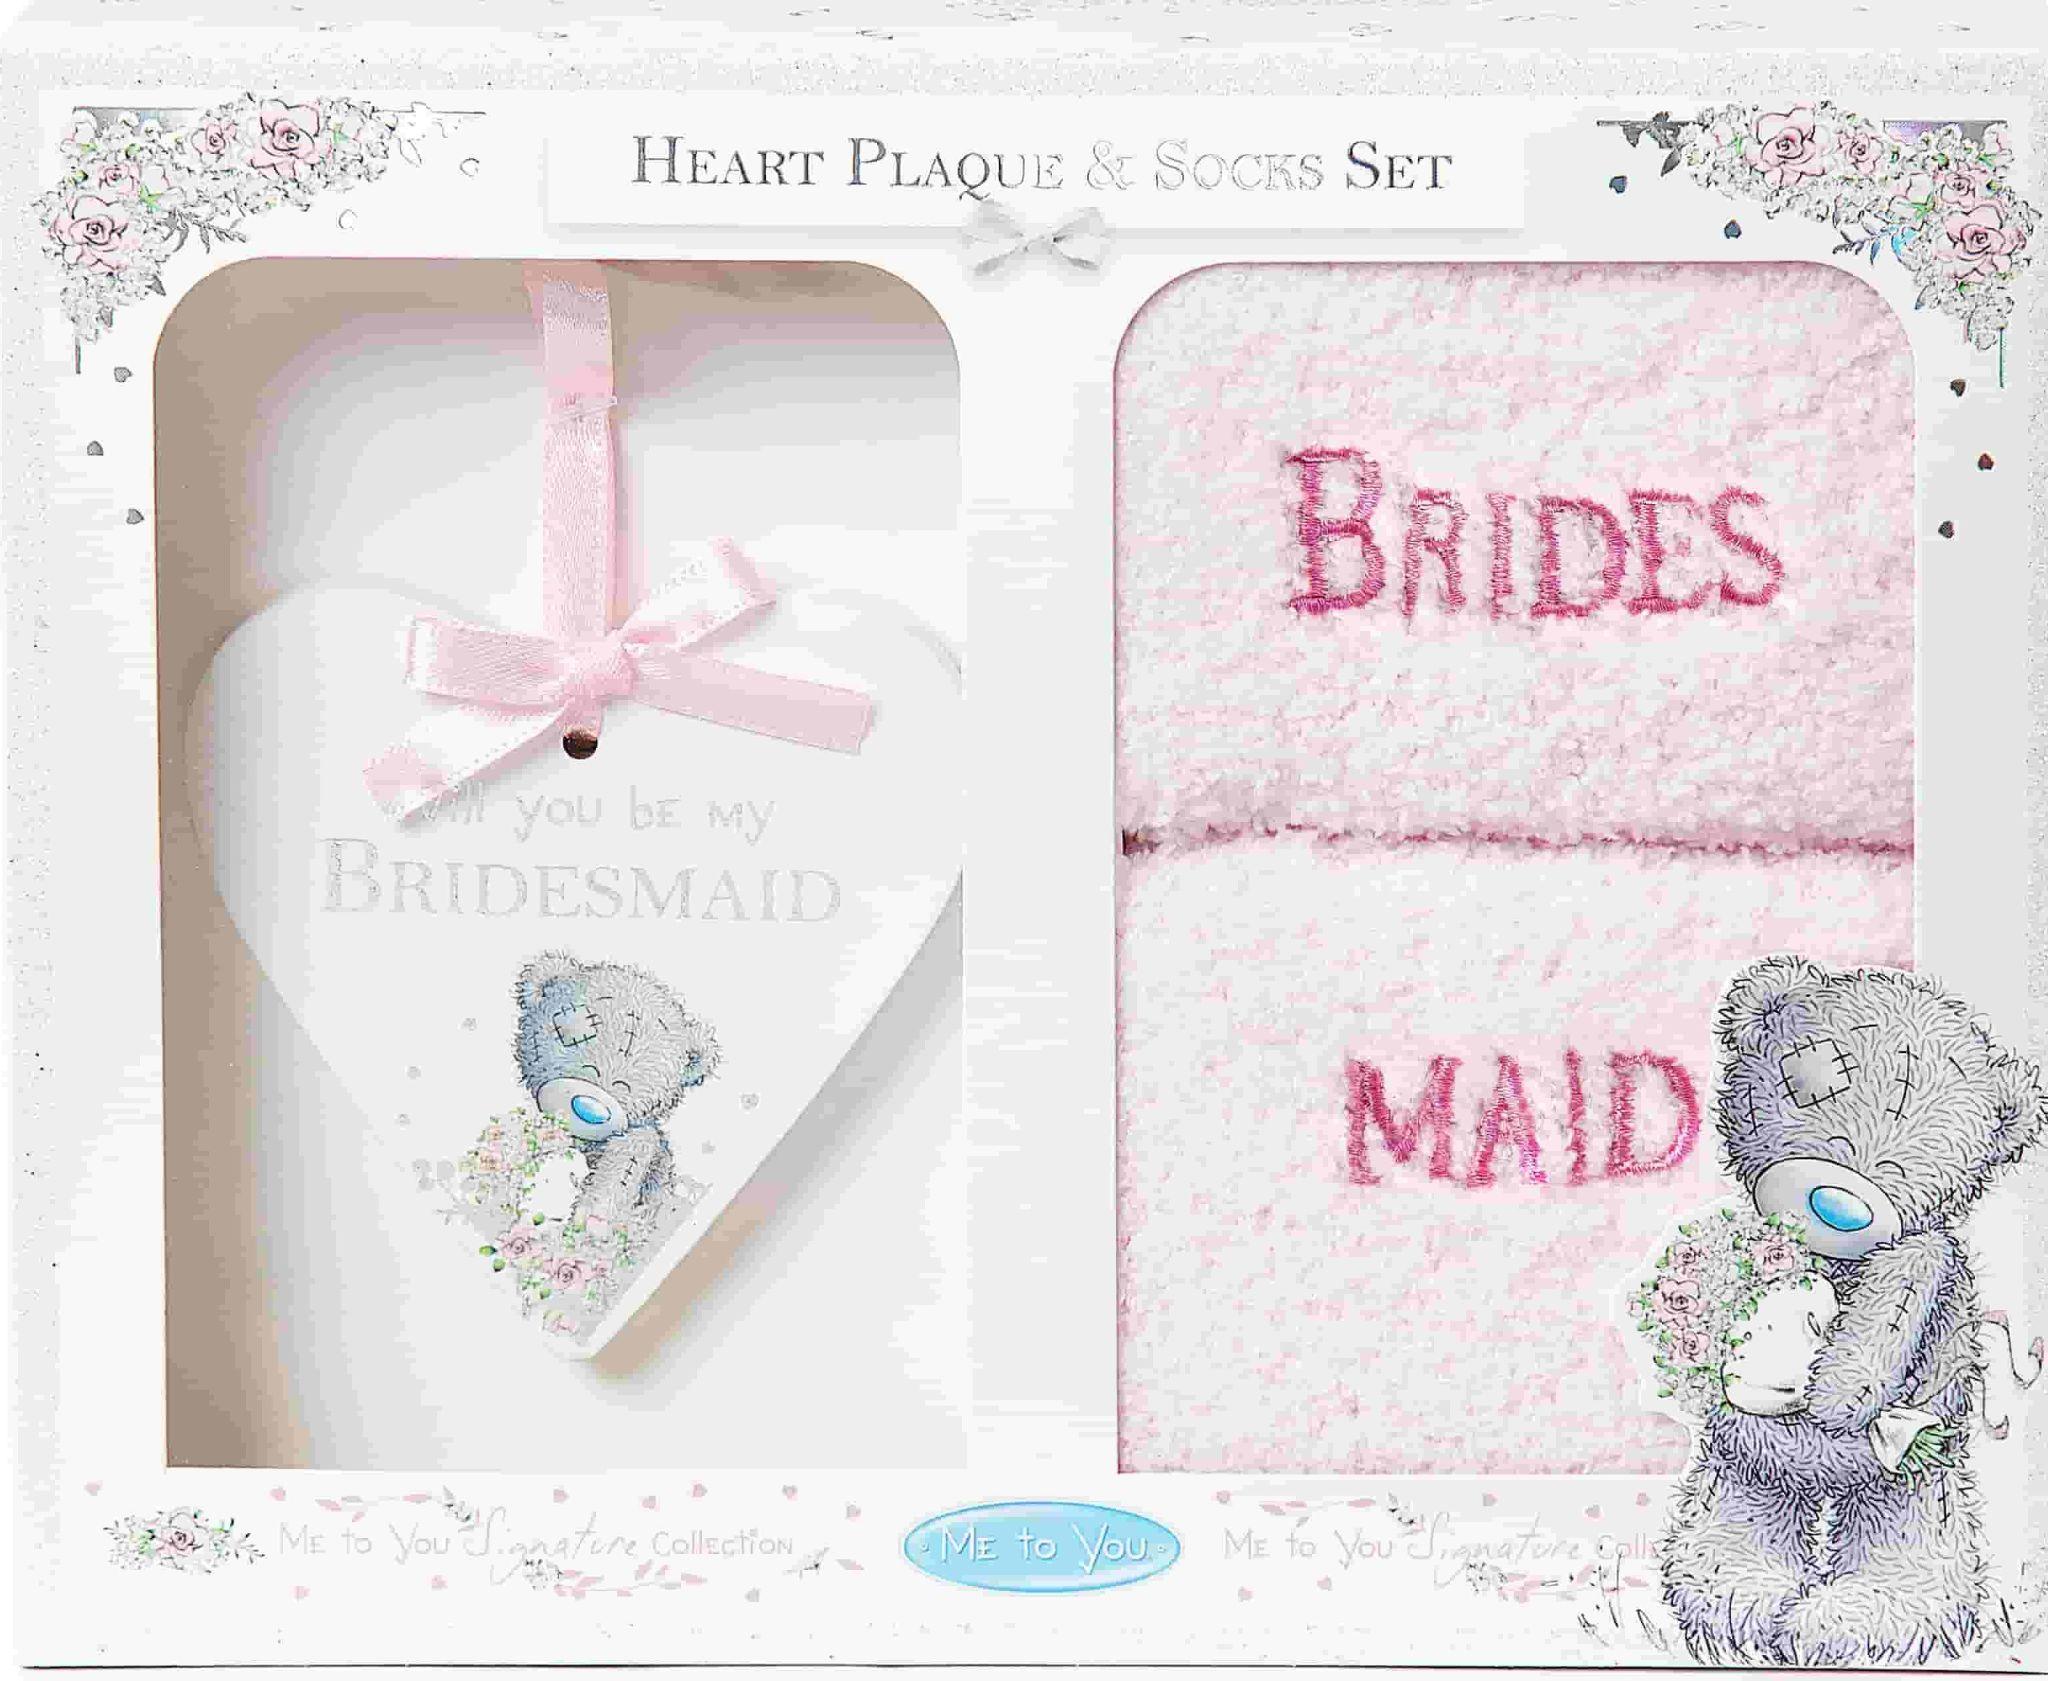 Clintons' bridesmaid plaque and sock set